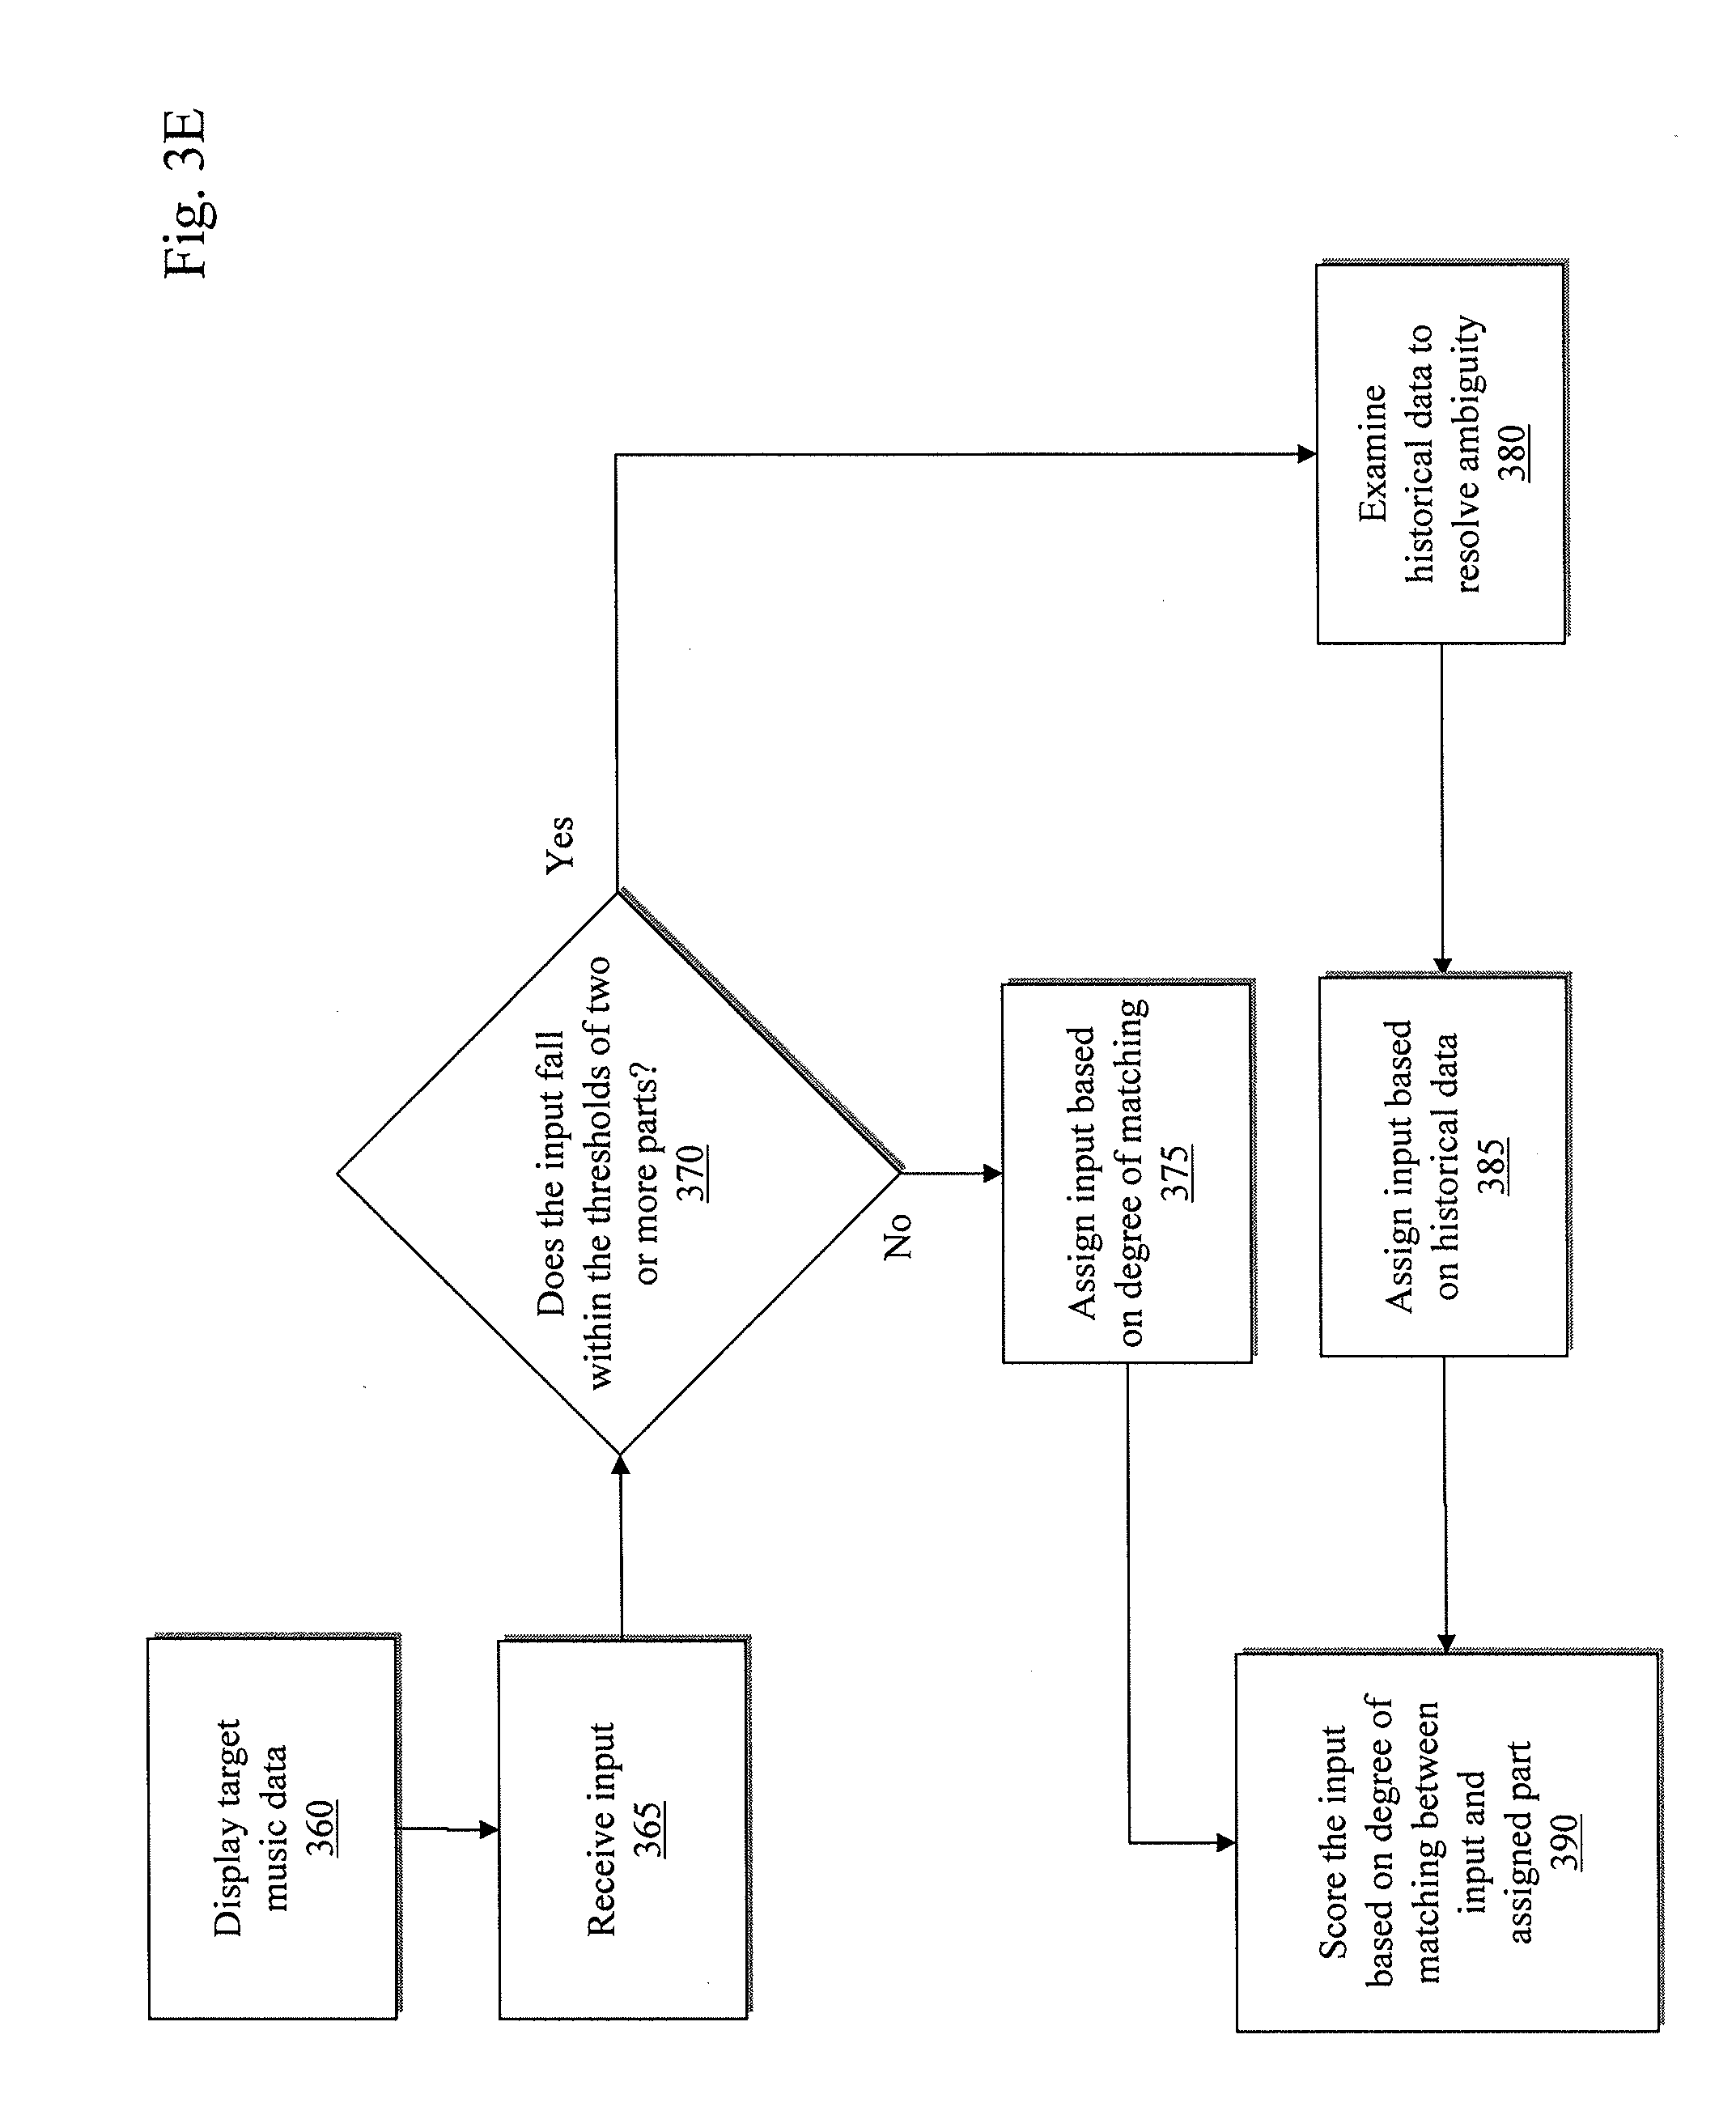 Patent US 8,465,366 B2